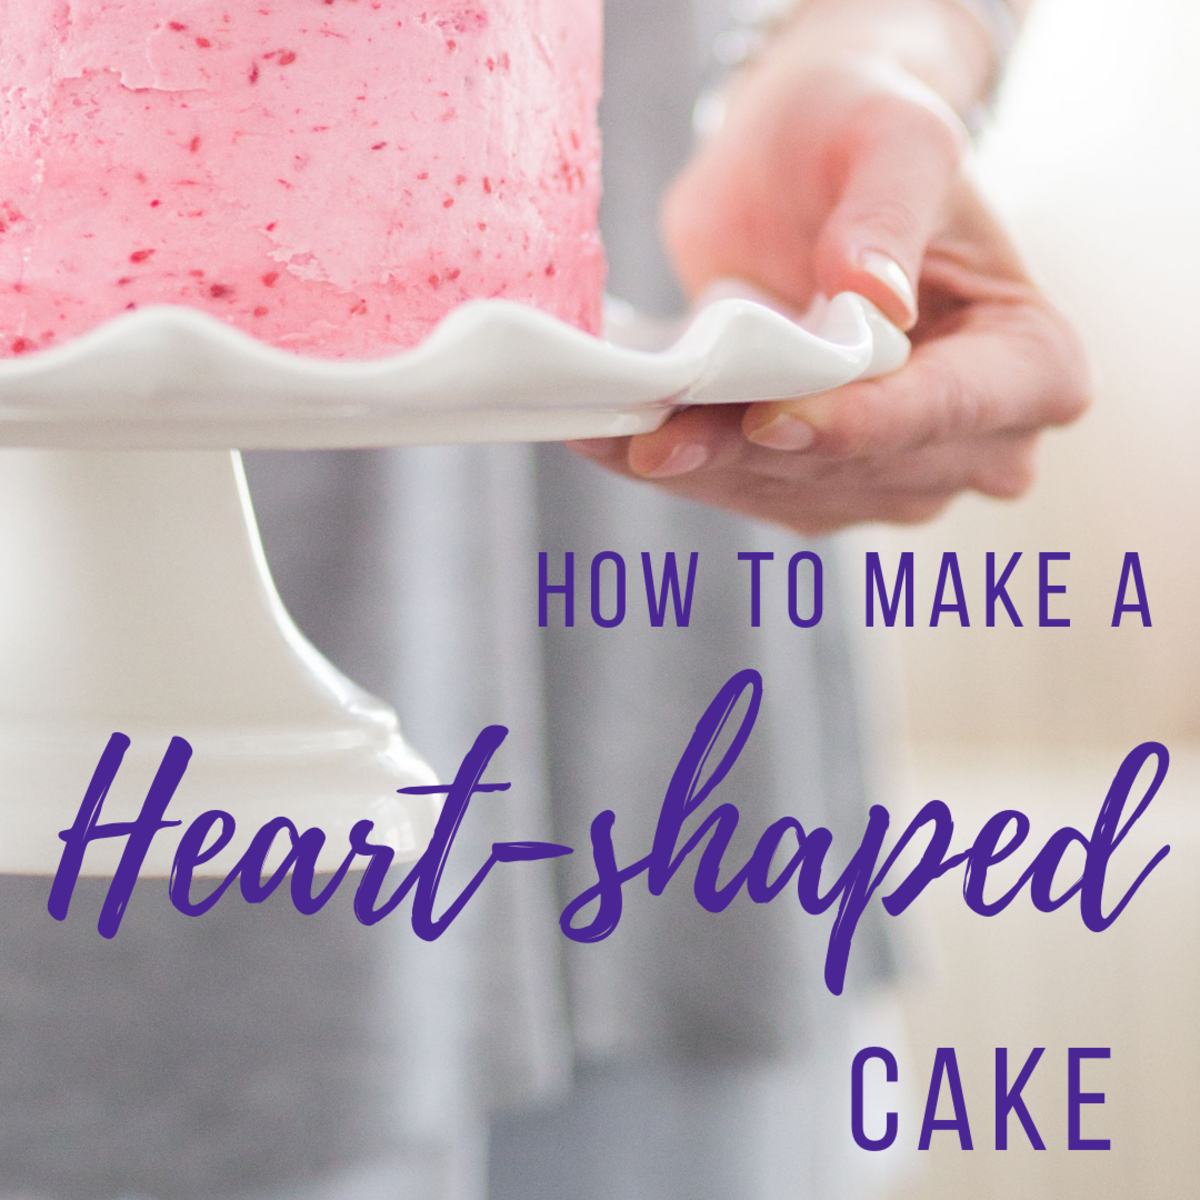 DIY Heart-Shaped Cake